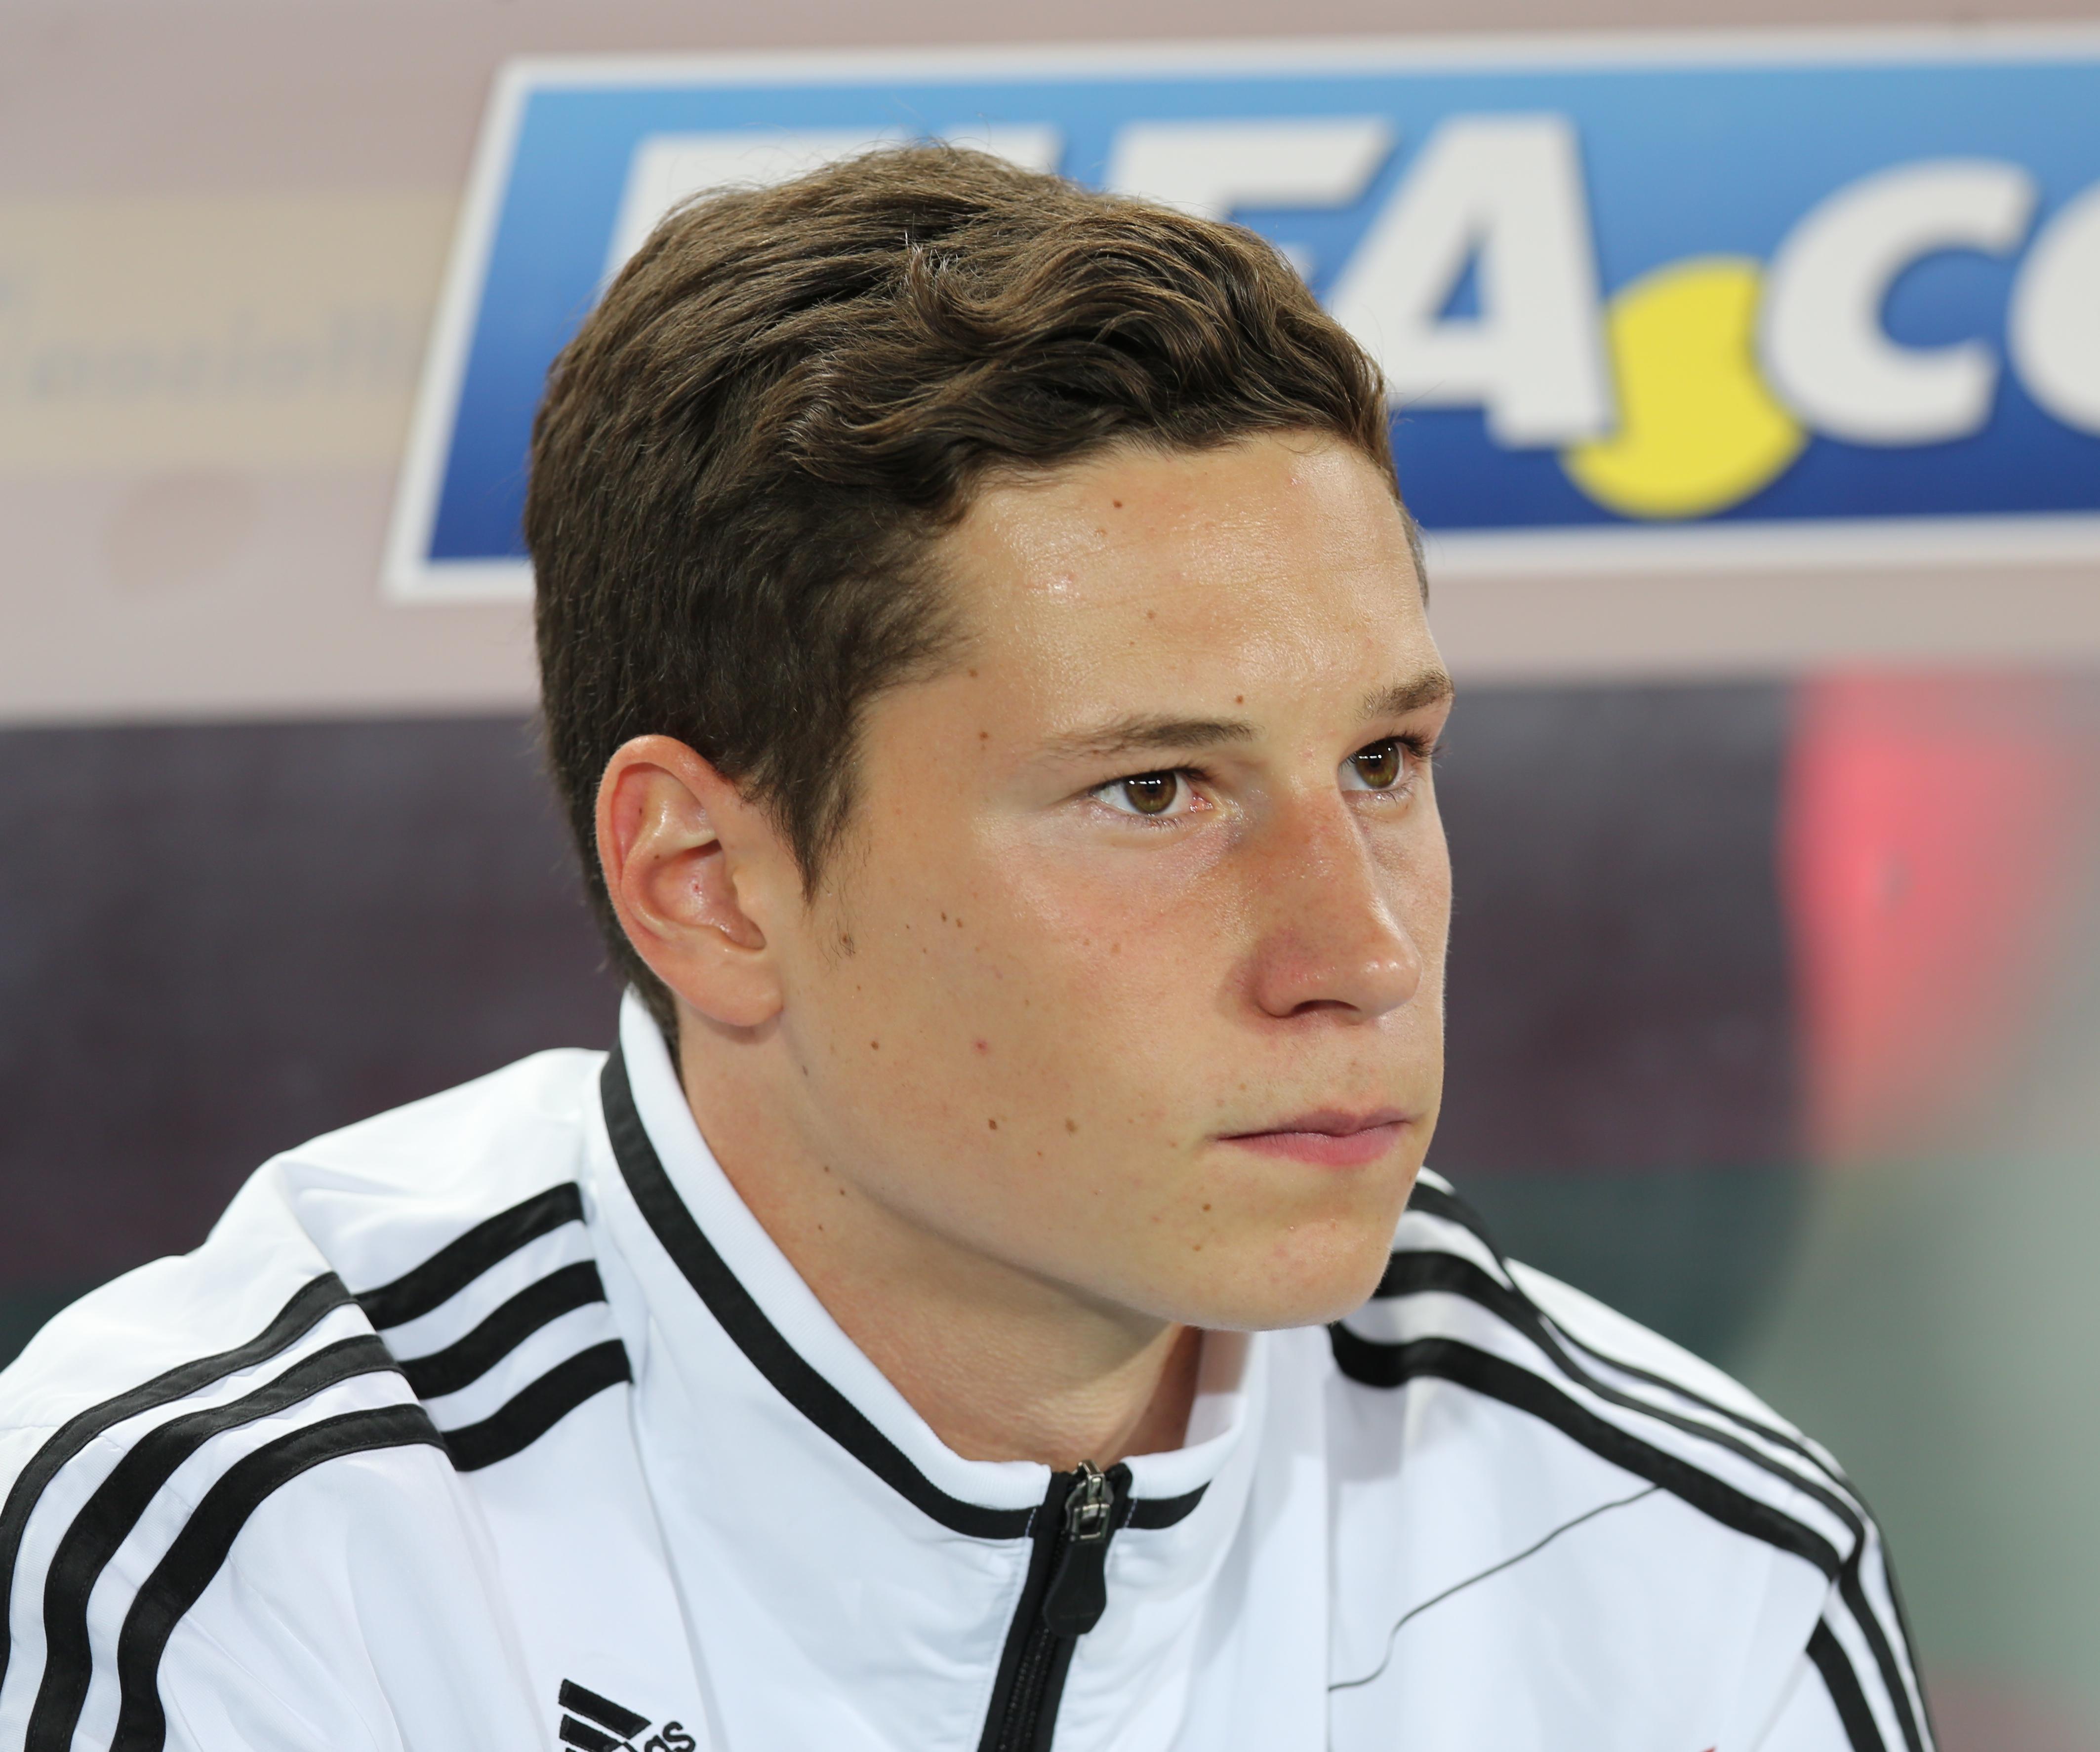 FIFA_WC-qualification_2014_-_Austria_vs._Germany_2012-09-11_-_Julian_Draxler_01